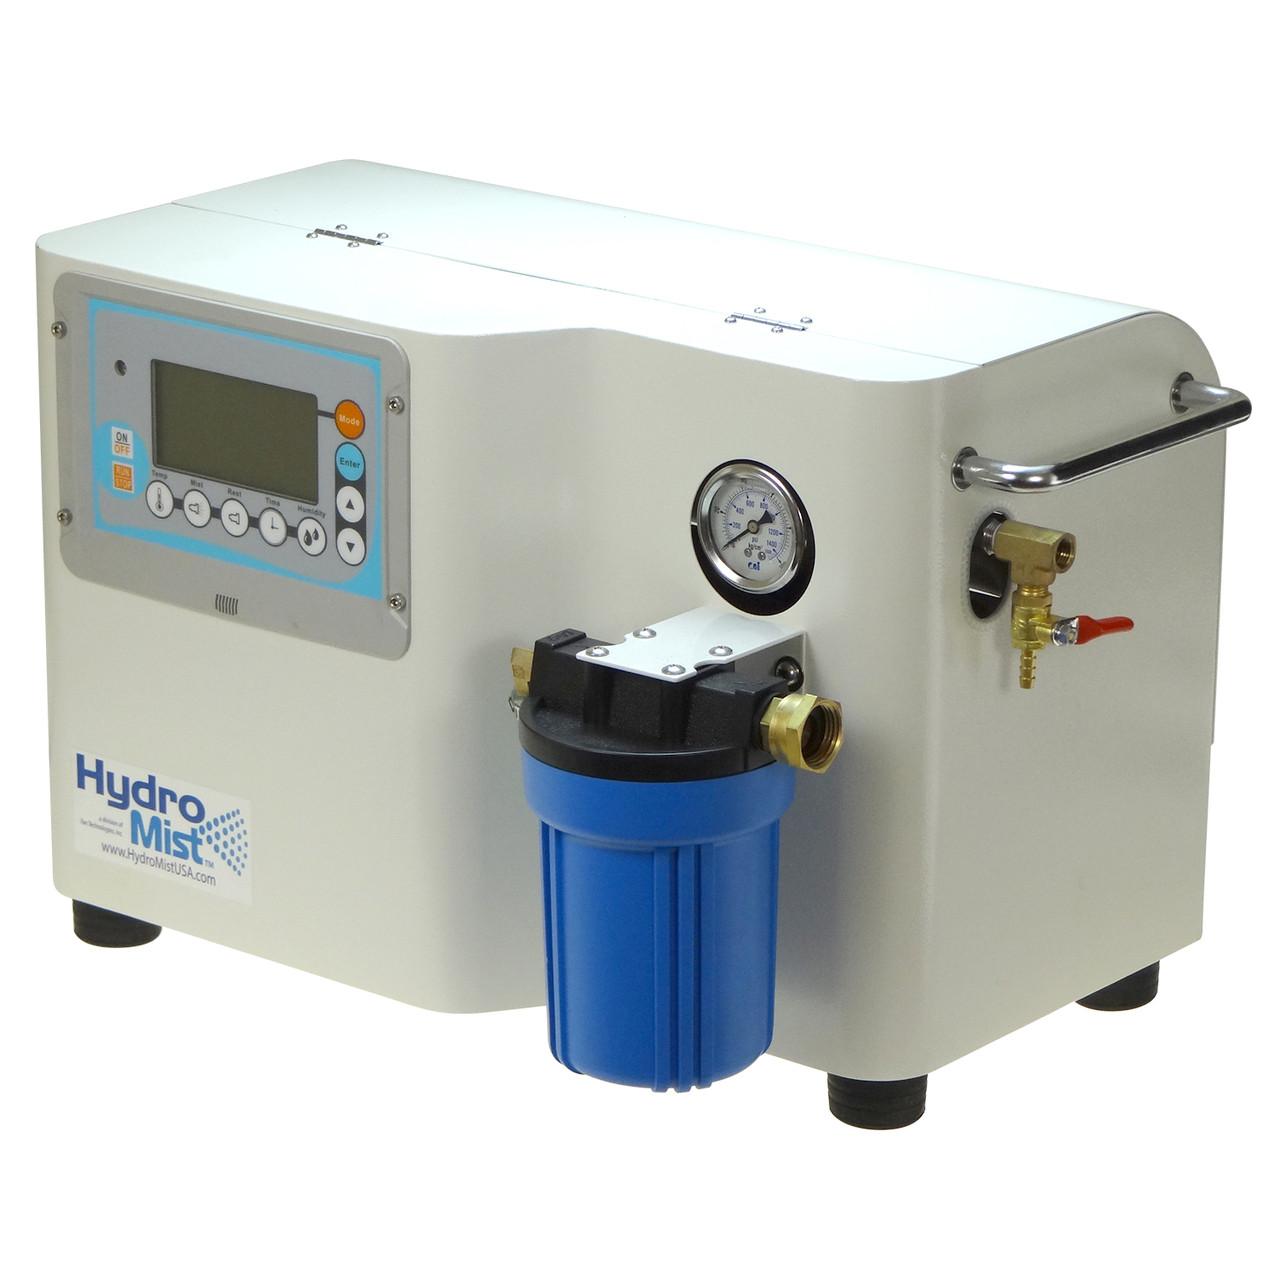 ProMist 75 High Pressure Mist Pump  (32 nozzles) - 1000 PSI